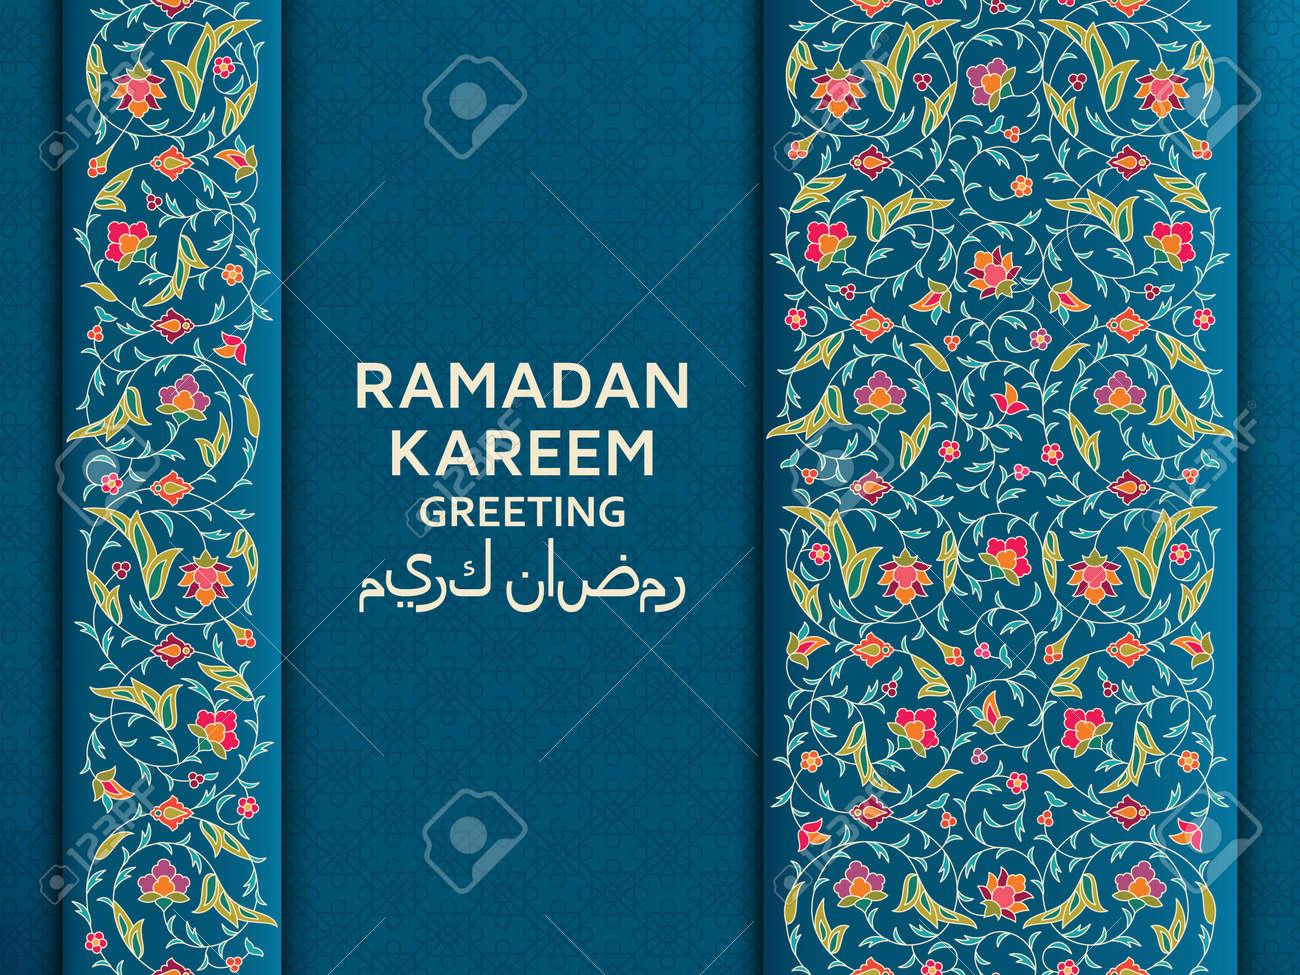 Ramadan Kareem Background. Arabesque Arabic floral pattern. Branches with flowers, leaves and petals. Translation Ramadan Kareem. Greeting card. Vector illustration. - 165277708